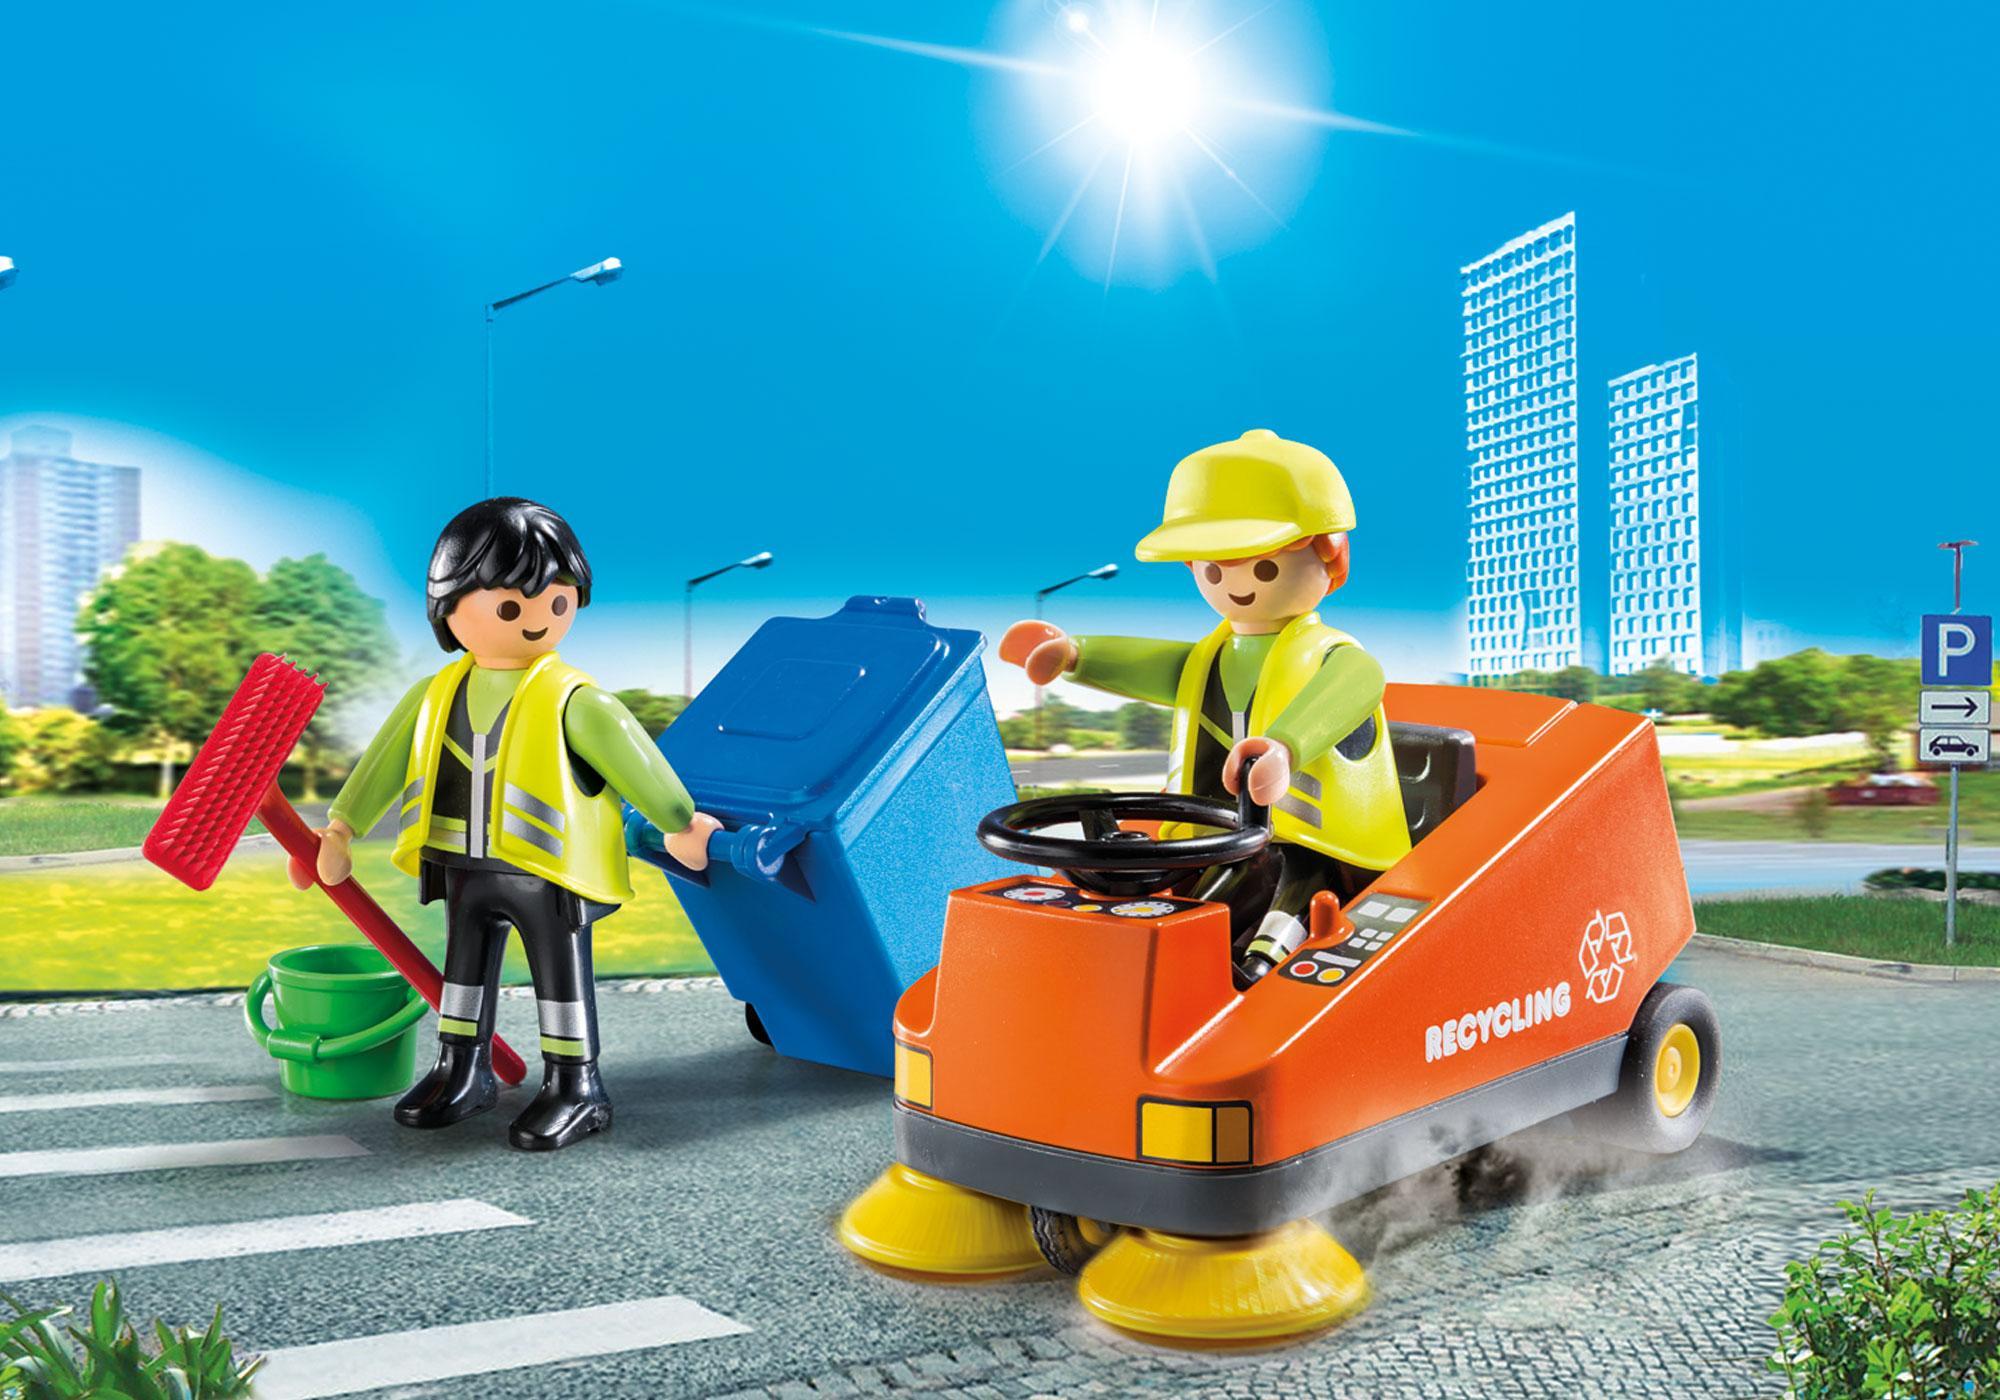 http://media.playmobil.com/i/playmobil/70203_product_detail/Street Sweeper